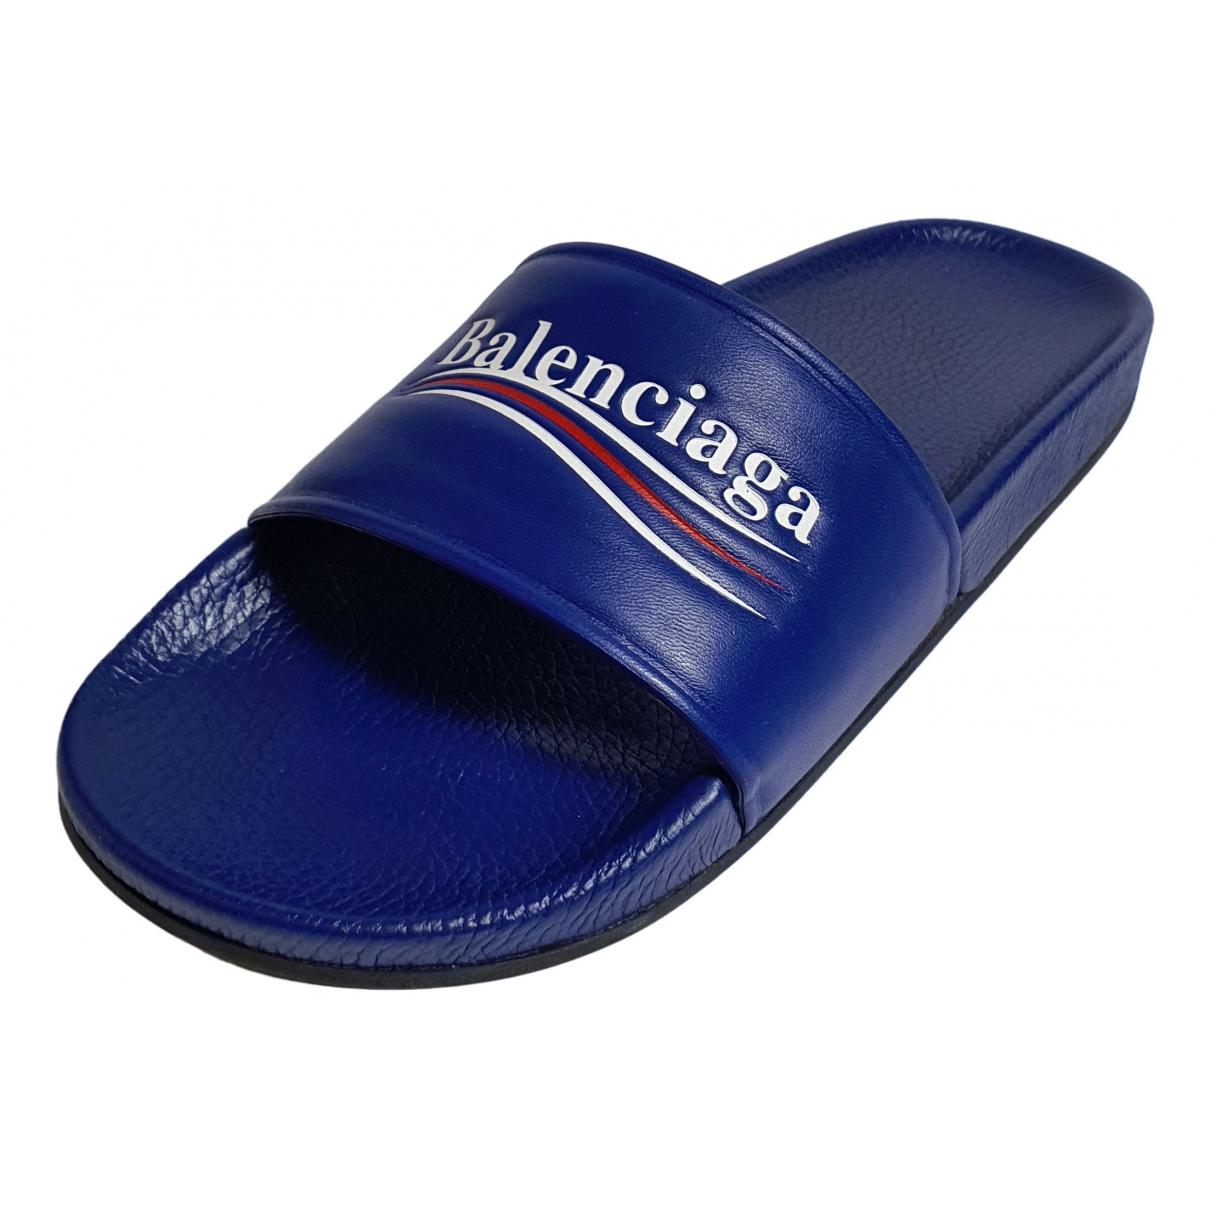 Balenciaga - Sandales   pour homme en cuir - bleu